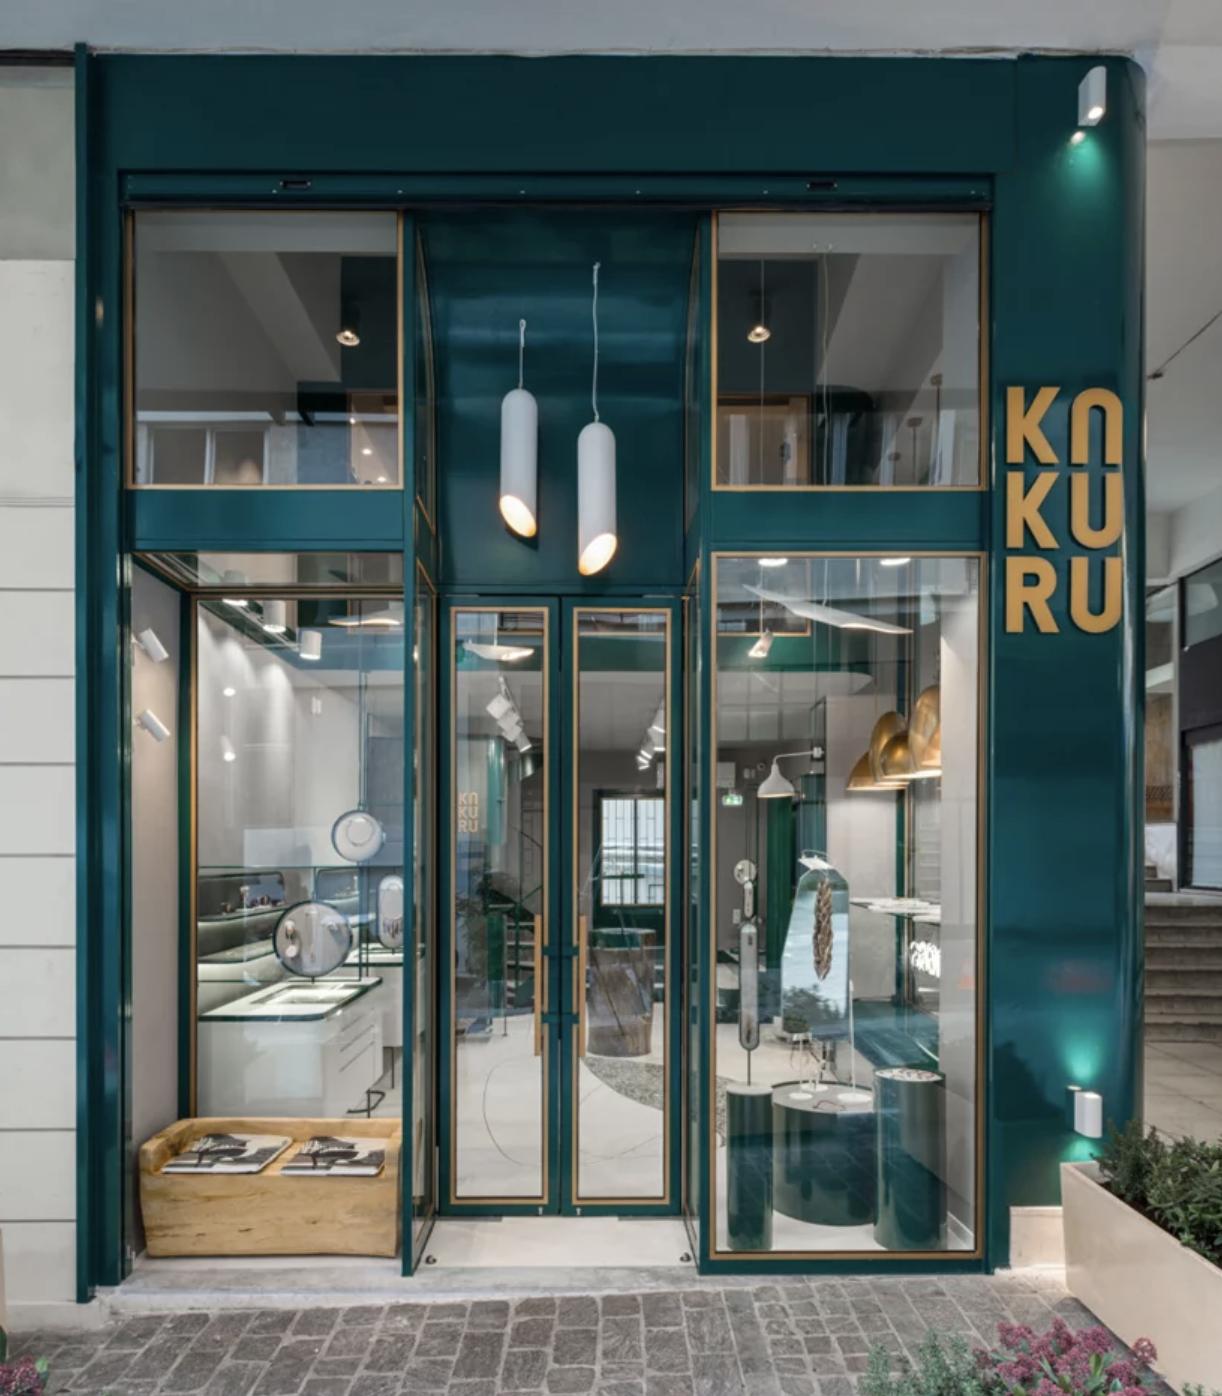 viventium-design-zac-kraemer-urban-soul-jewelry-retail-design-13.png